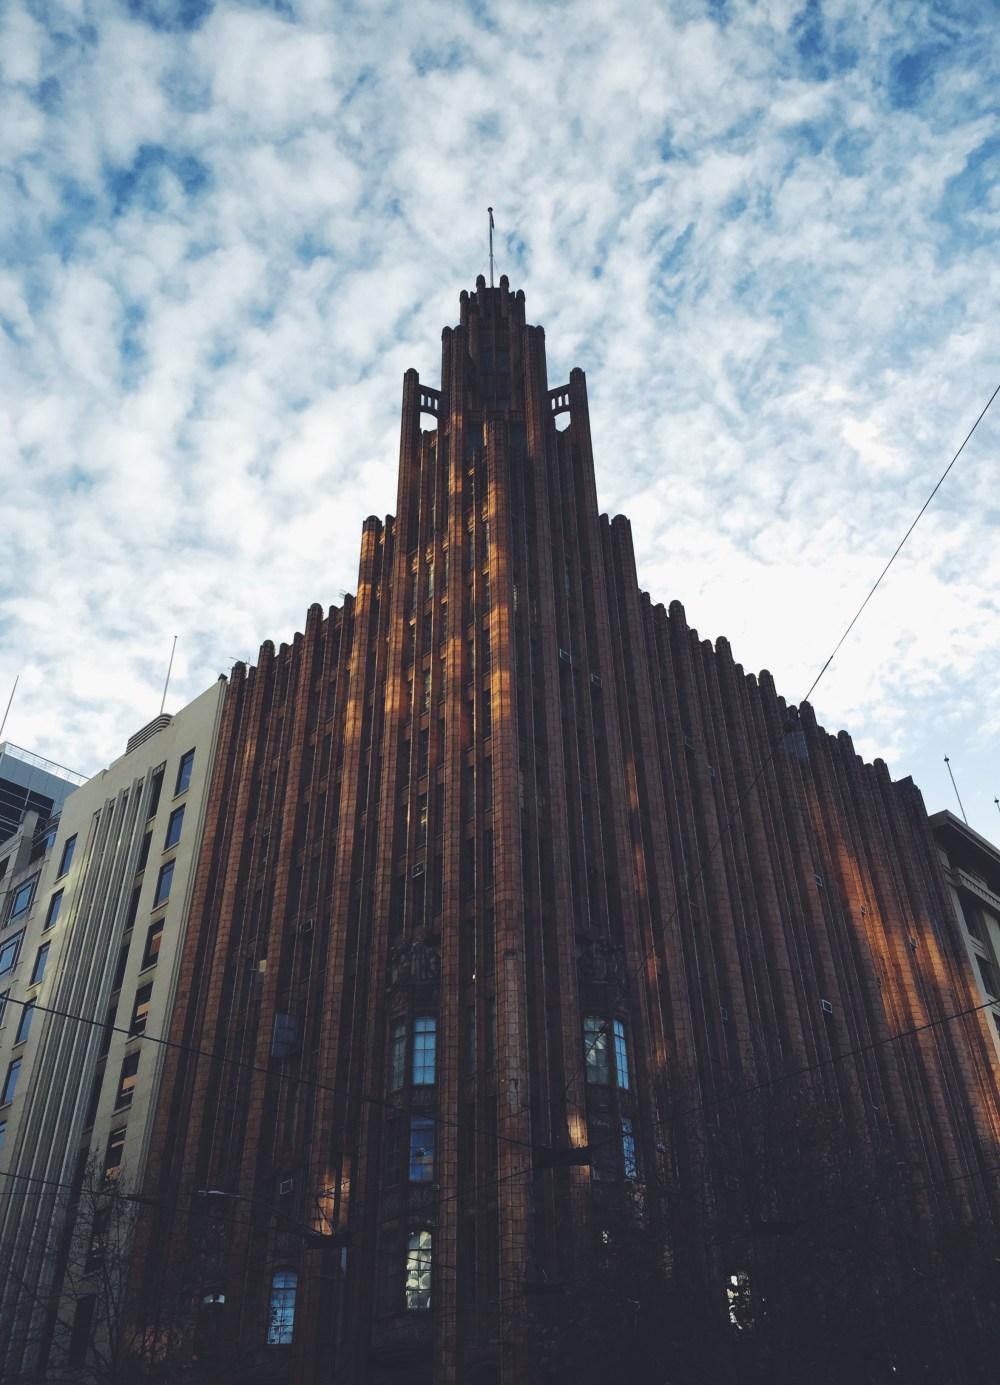 25 June 2016: Manchester Unity Building | Melbourne, Victoria